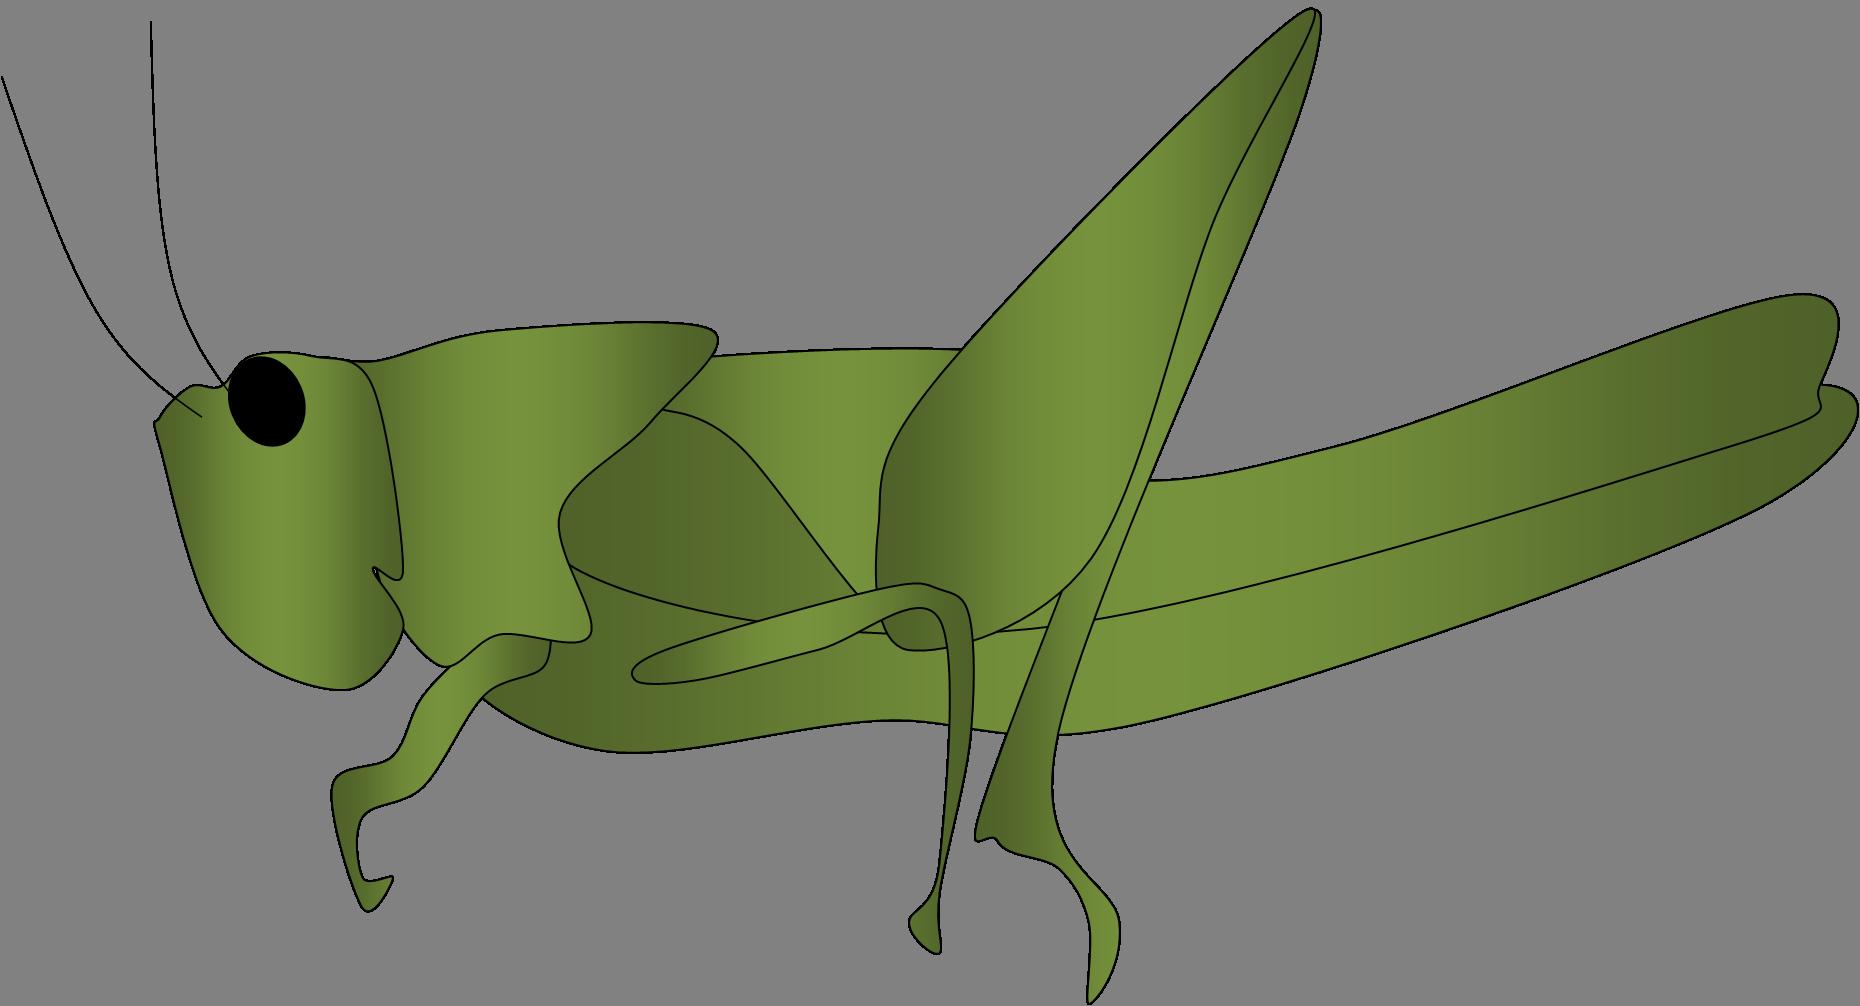 Grasshopper Clipart Lucost image - vector clip art